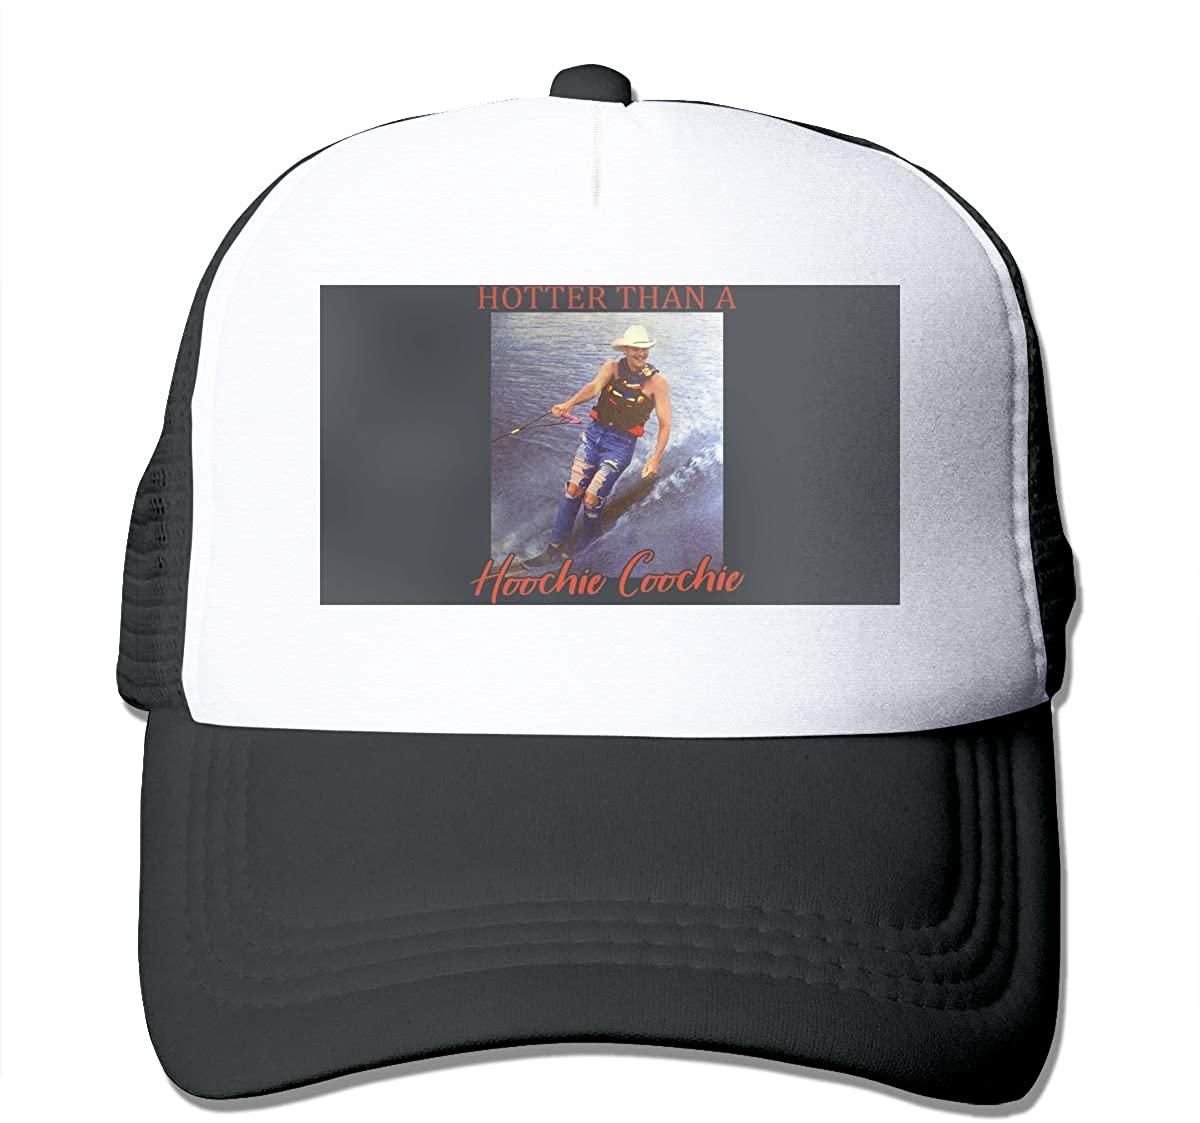 Alan-Jackson Hotter Than A Hoochie Coochie Vintage Unisex Trucker Hats Adjustable Hat Cap